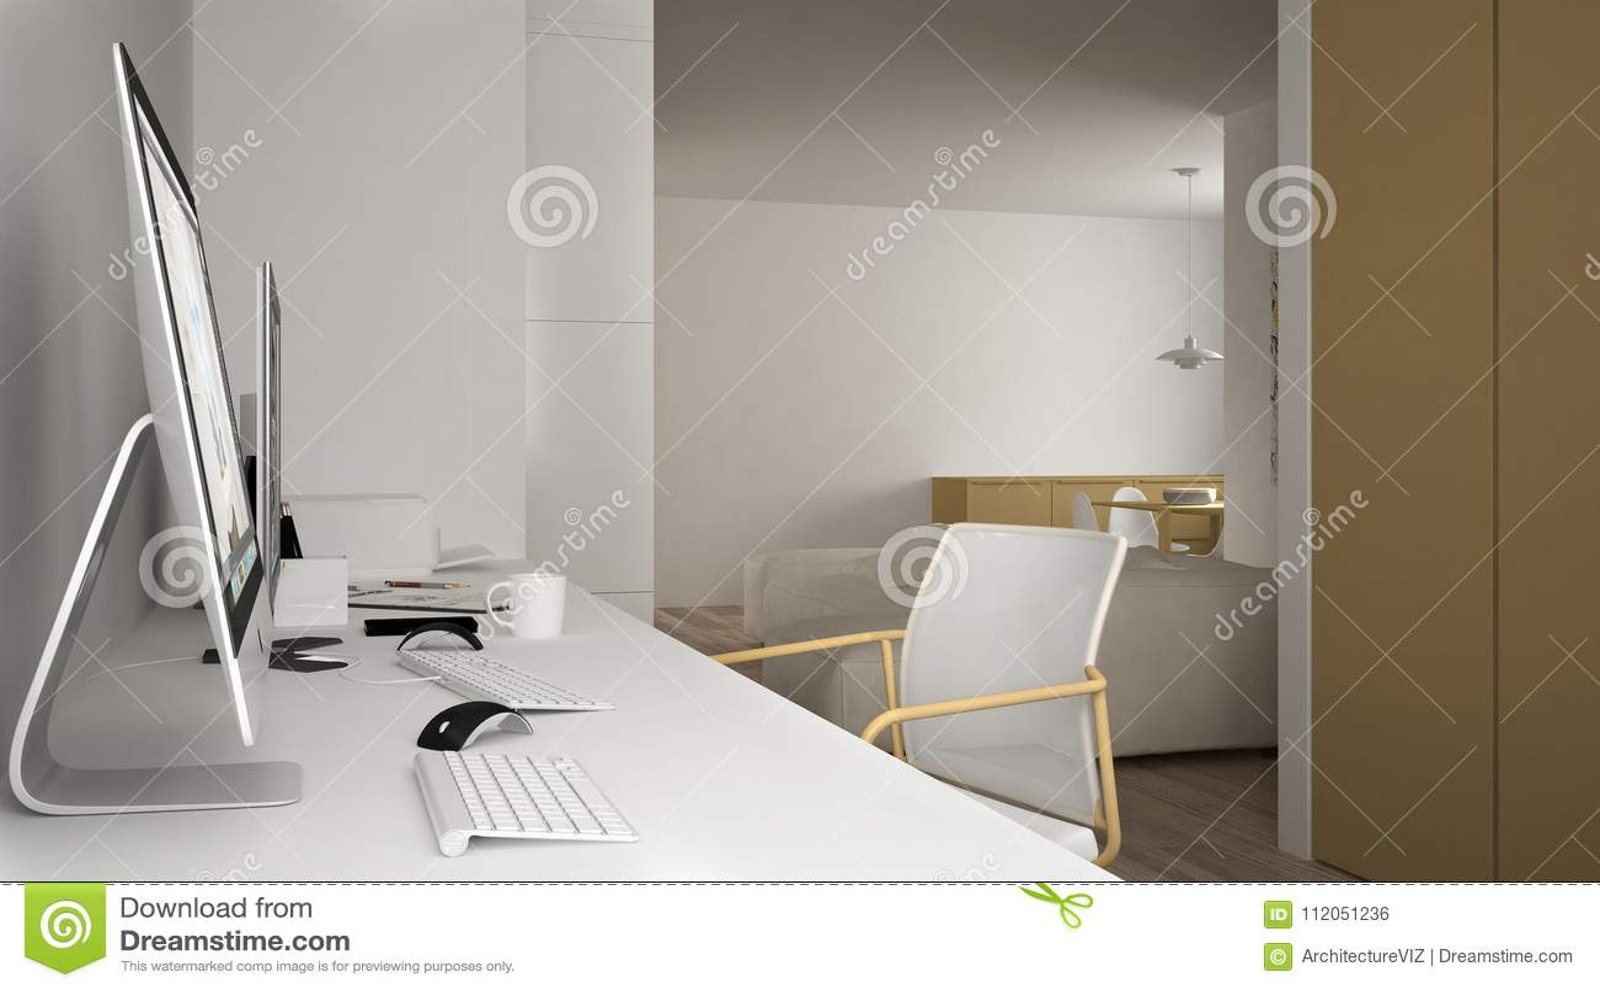 Moderne werkplaats in minimalistisch huis, bureau met computers, sleutelwoorden en muis, comfortabel wit en geel architectuurbinn